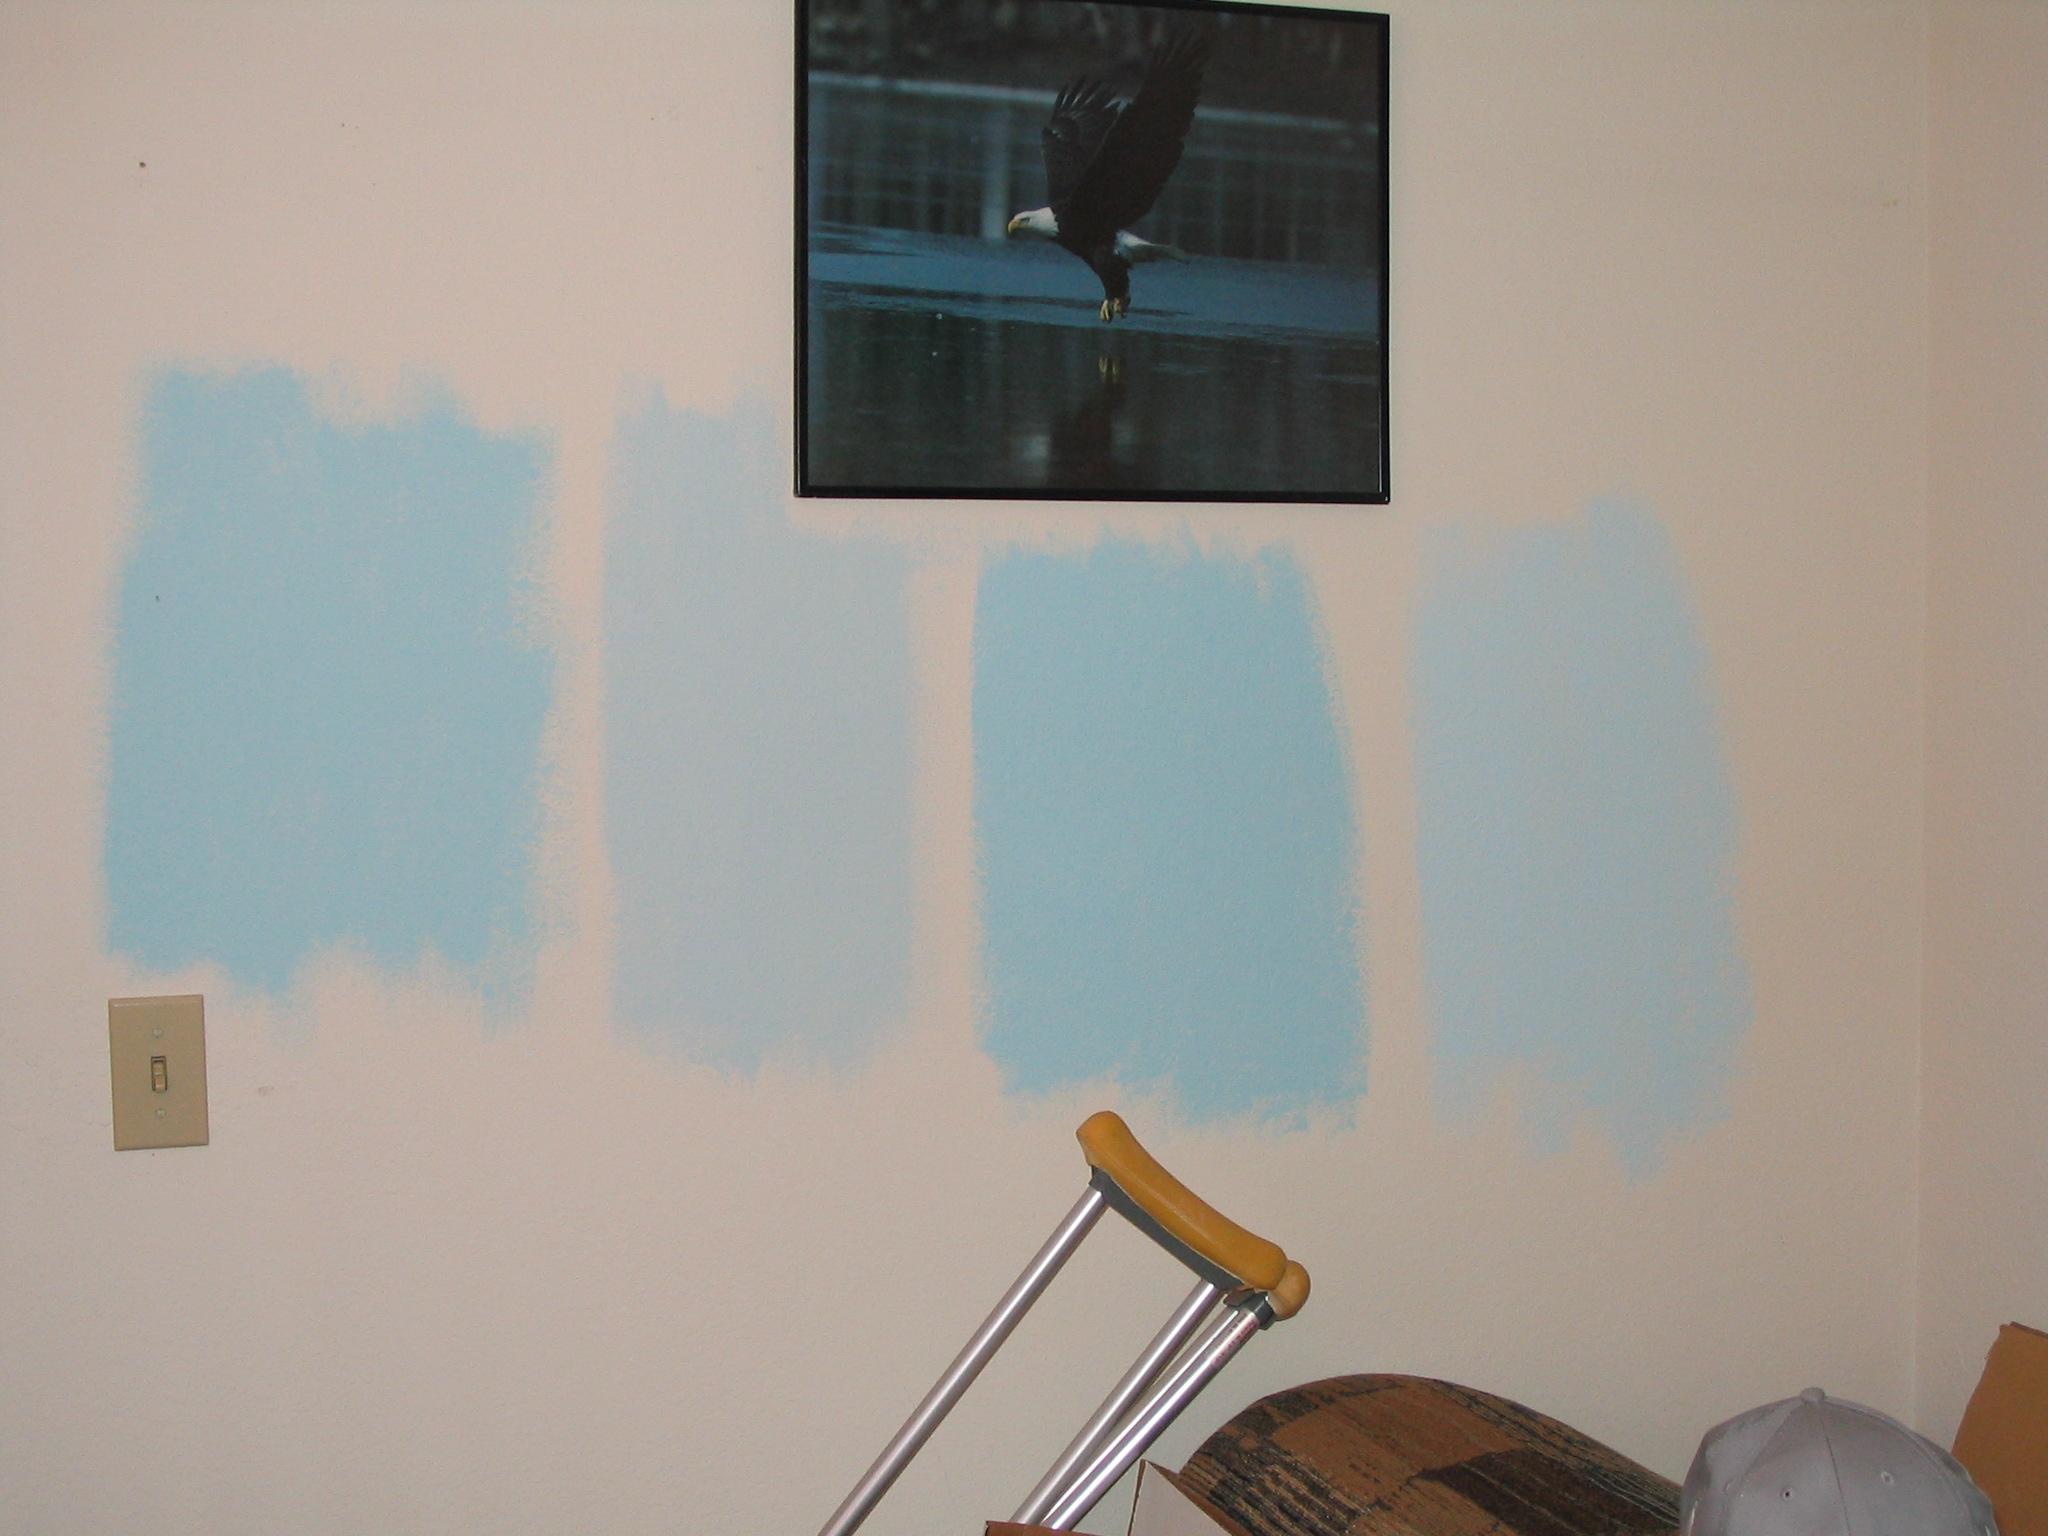 Benjamin moore paint samples for Light sky blue paint